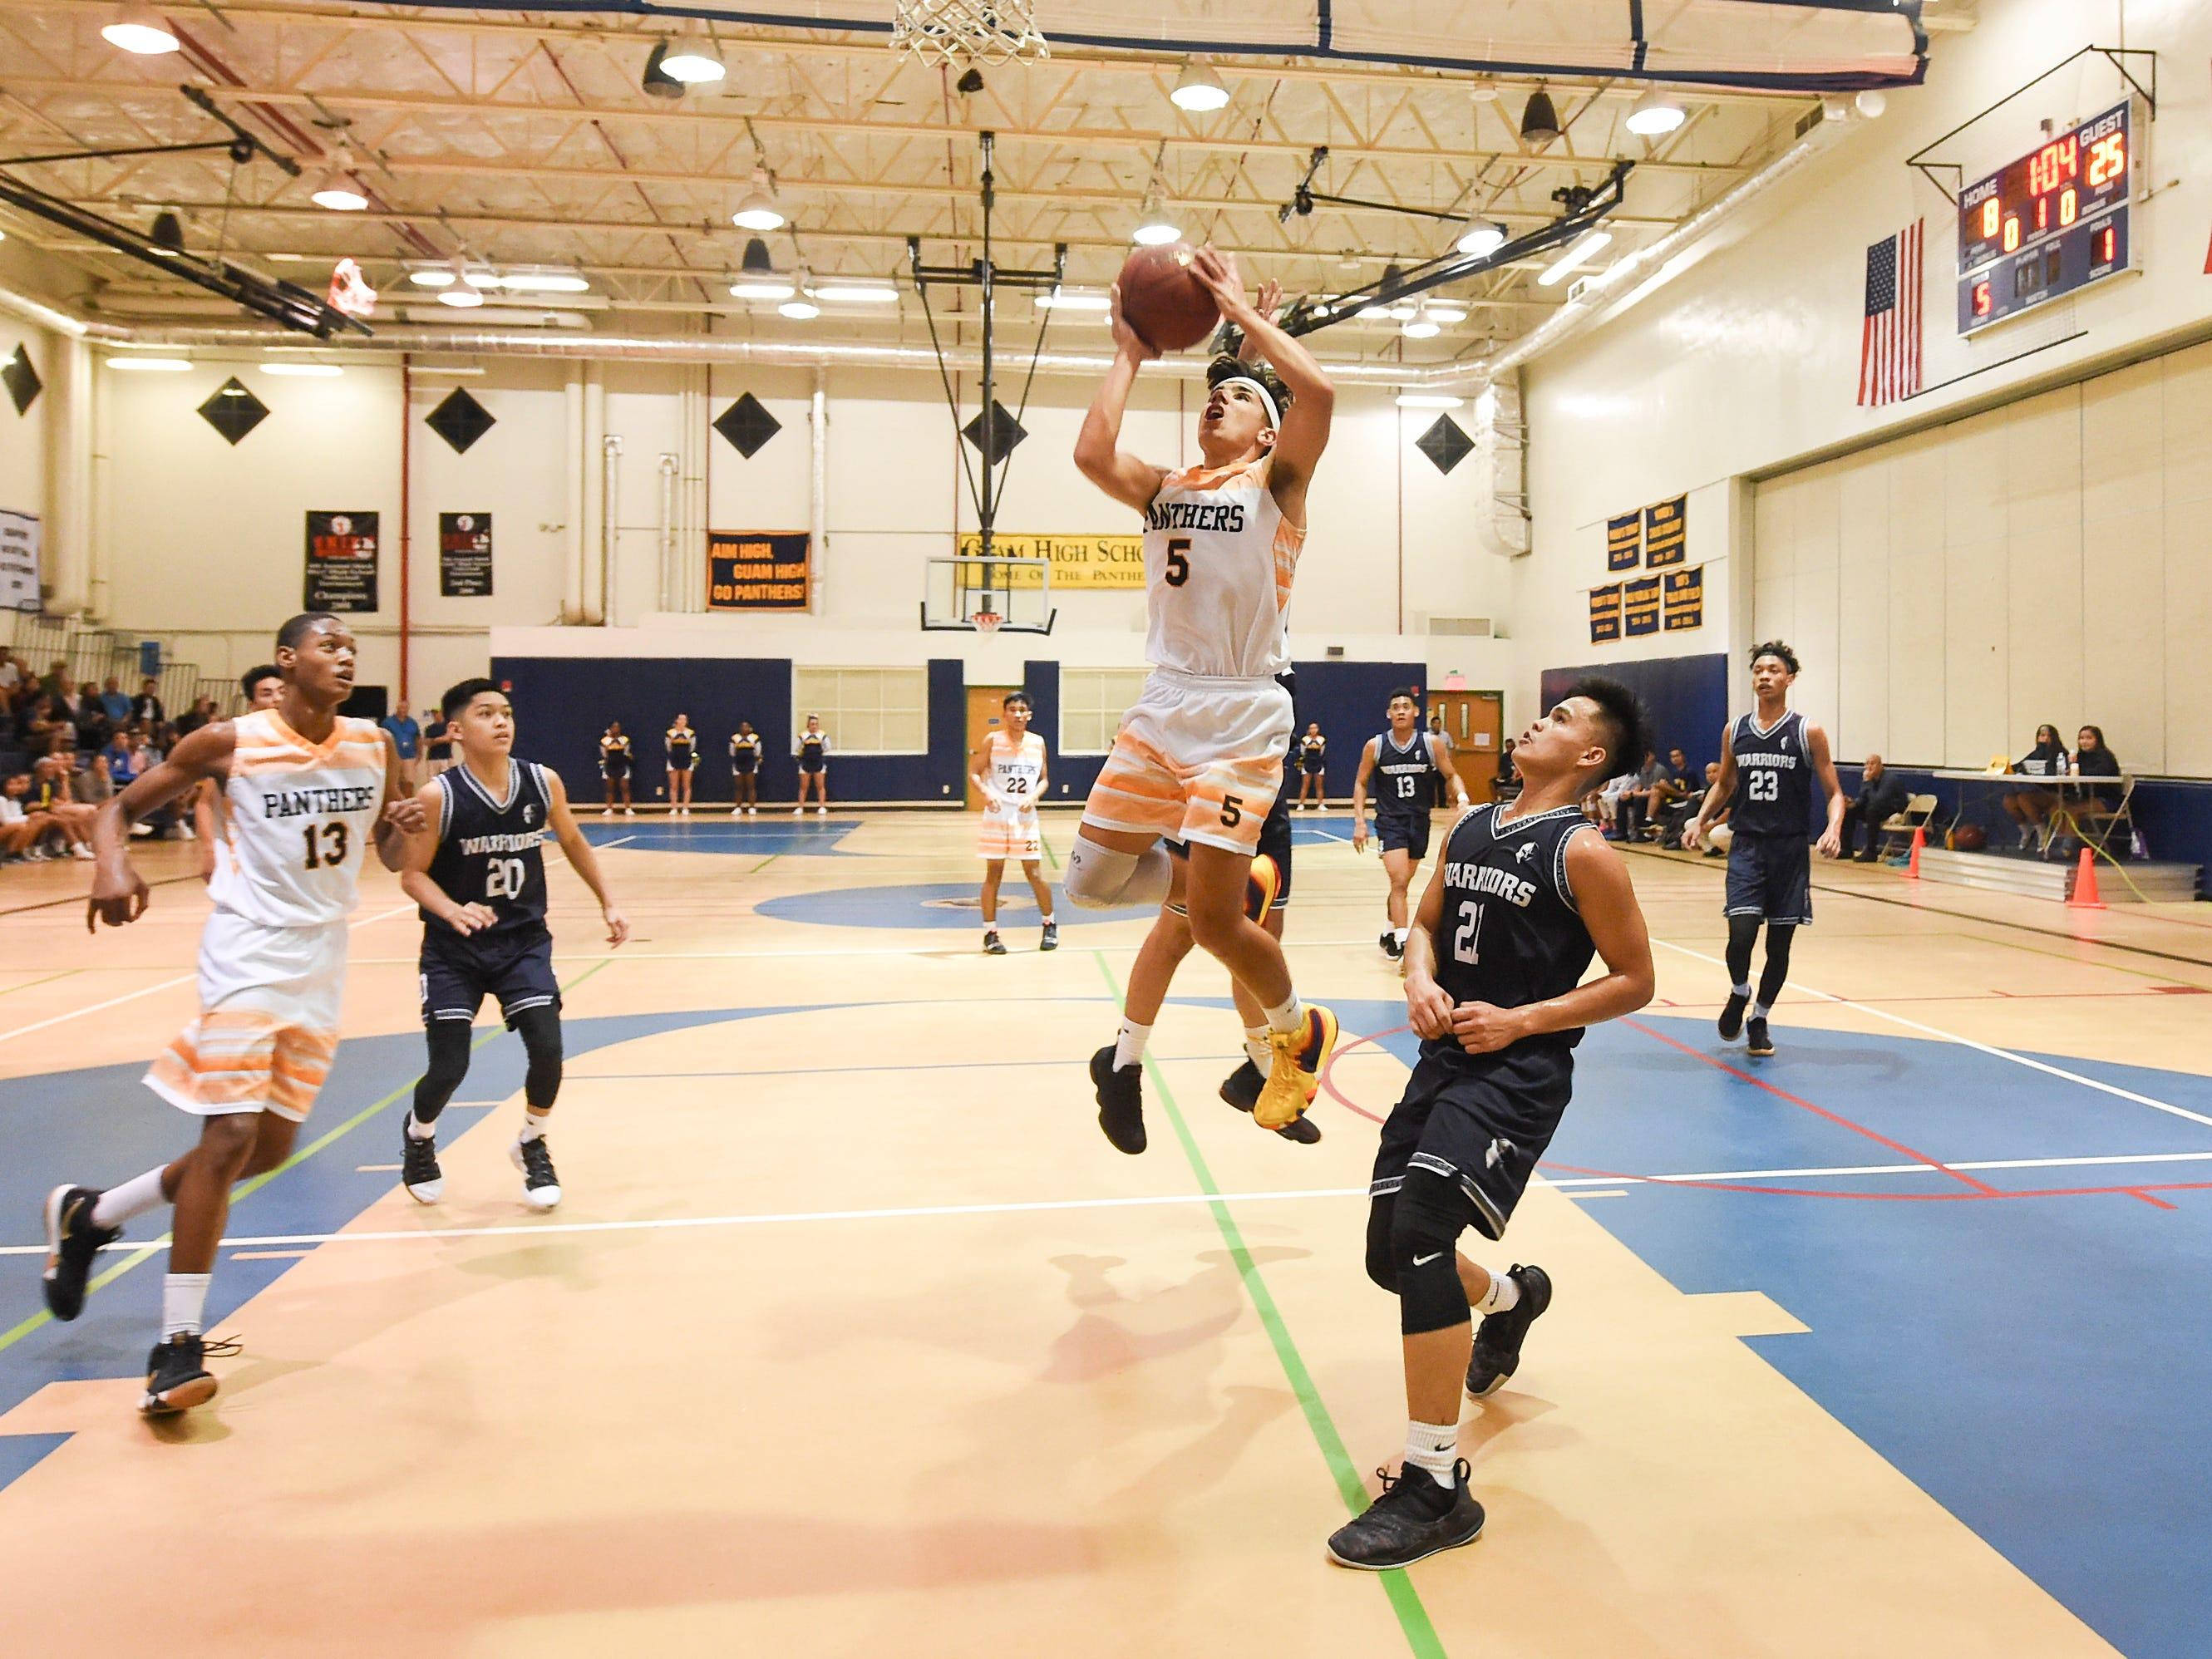 Guam High's Nicholas Keefe (5) attempts a shot against the St. Paul Warriors during their IIAAG Boys' Basketball game at the Guam High School Gym, Feb. 5, 2019.